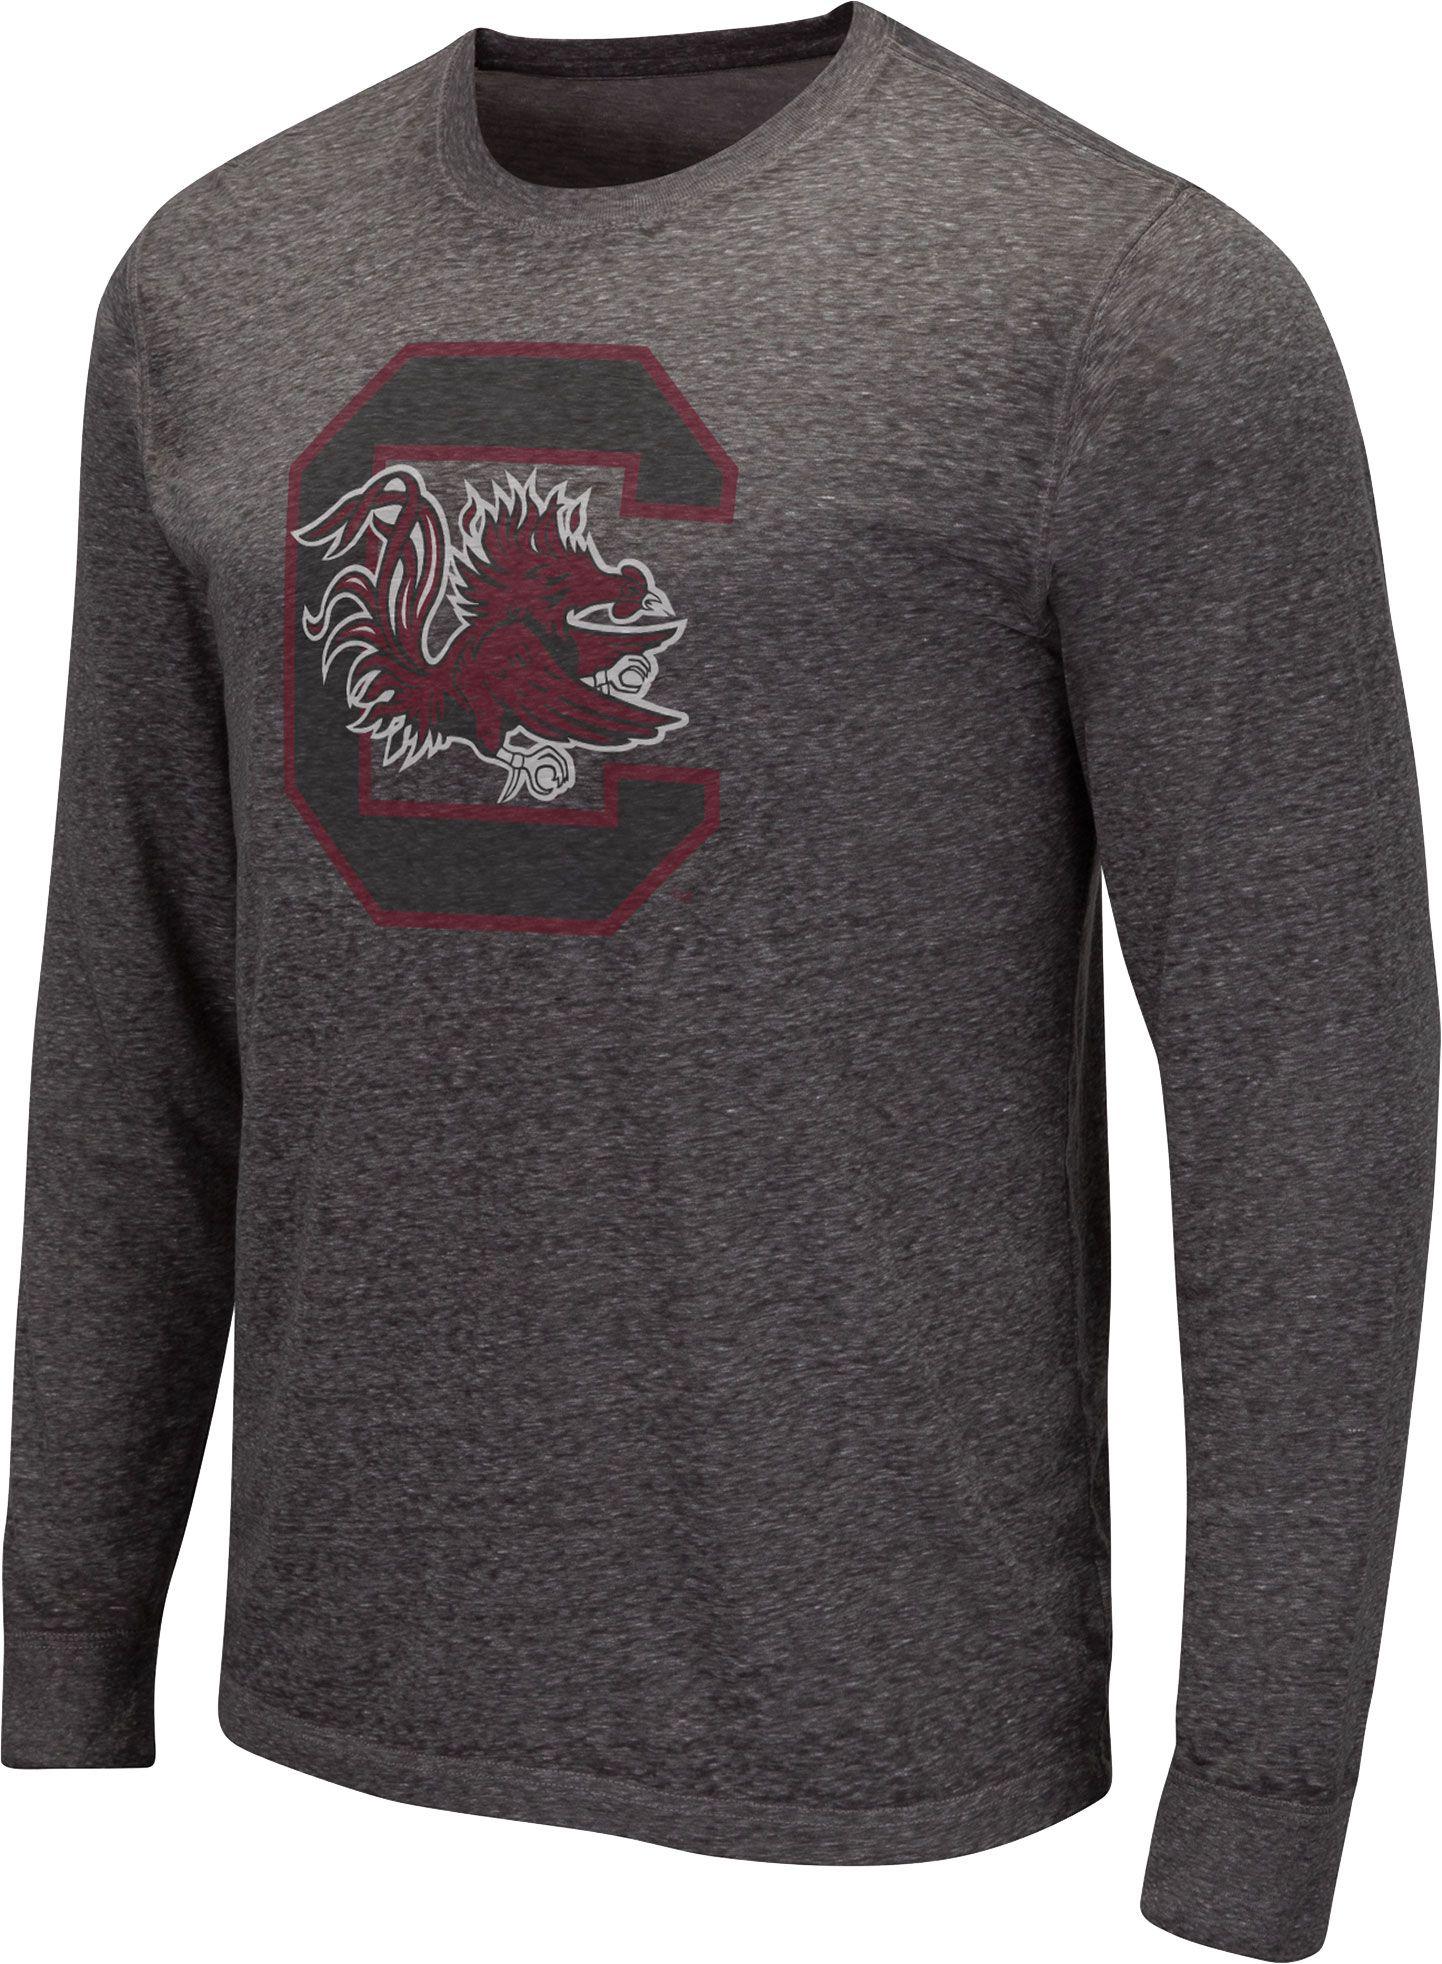 4f36d3b7 Mens Long Sleeve T Shirts 2019 | Greek T Shirt - Part 149